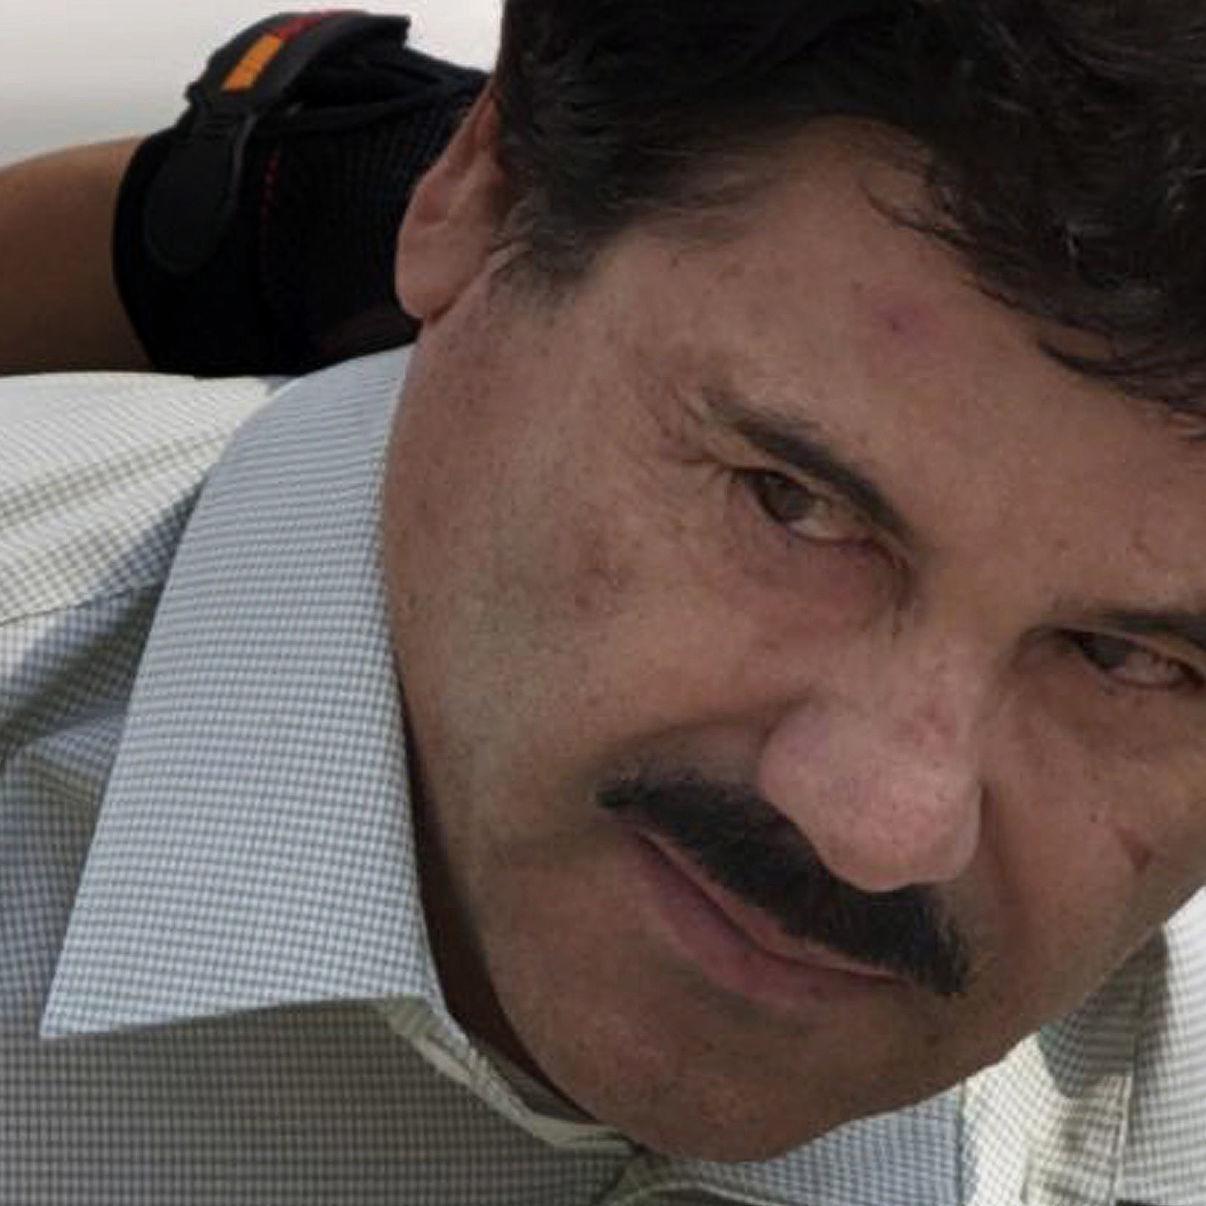 Mexican drug kingpin Joaquin 'El Chapo' Guzman sentenced to